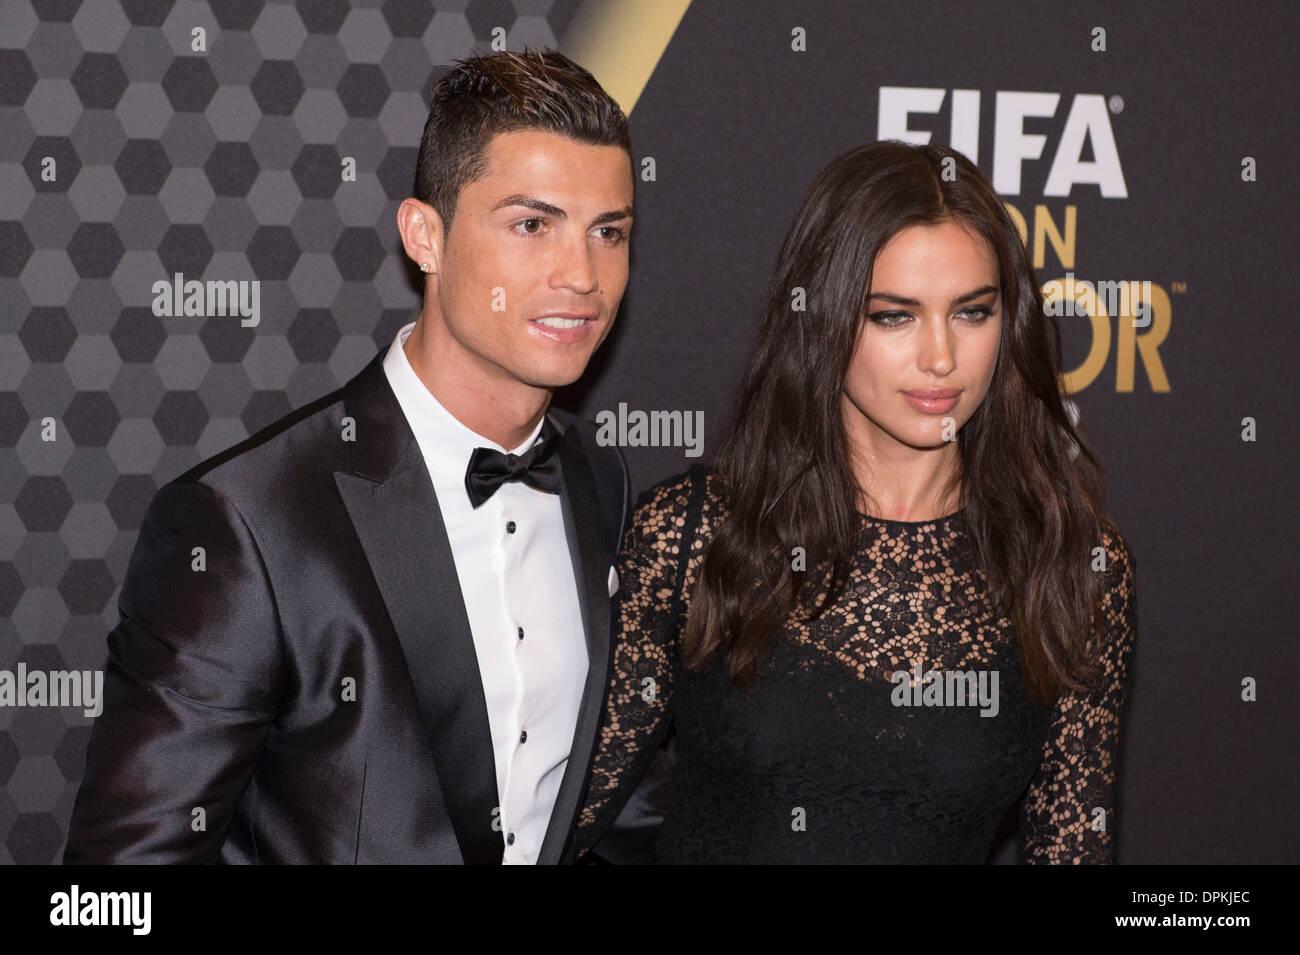 Zurich, Switzerland. 13th Jan, 2014. (L-R) Cristiano ... Irina Shayk Cristiano Ronaldo 2014